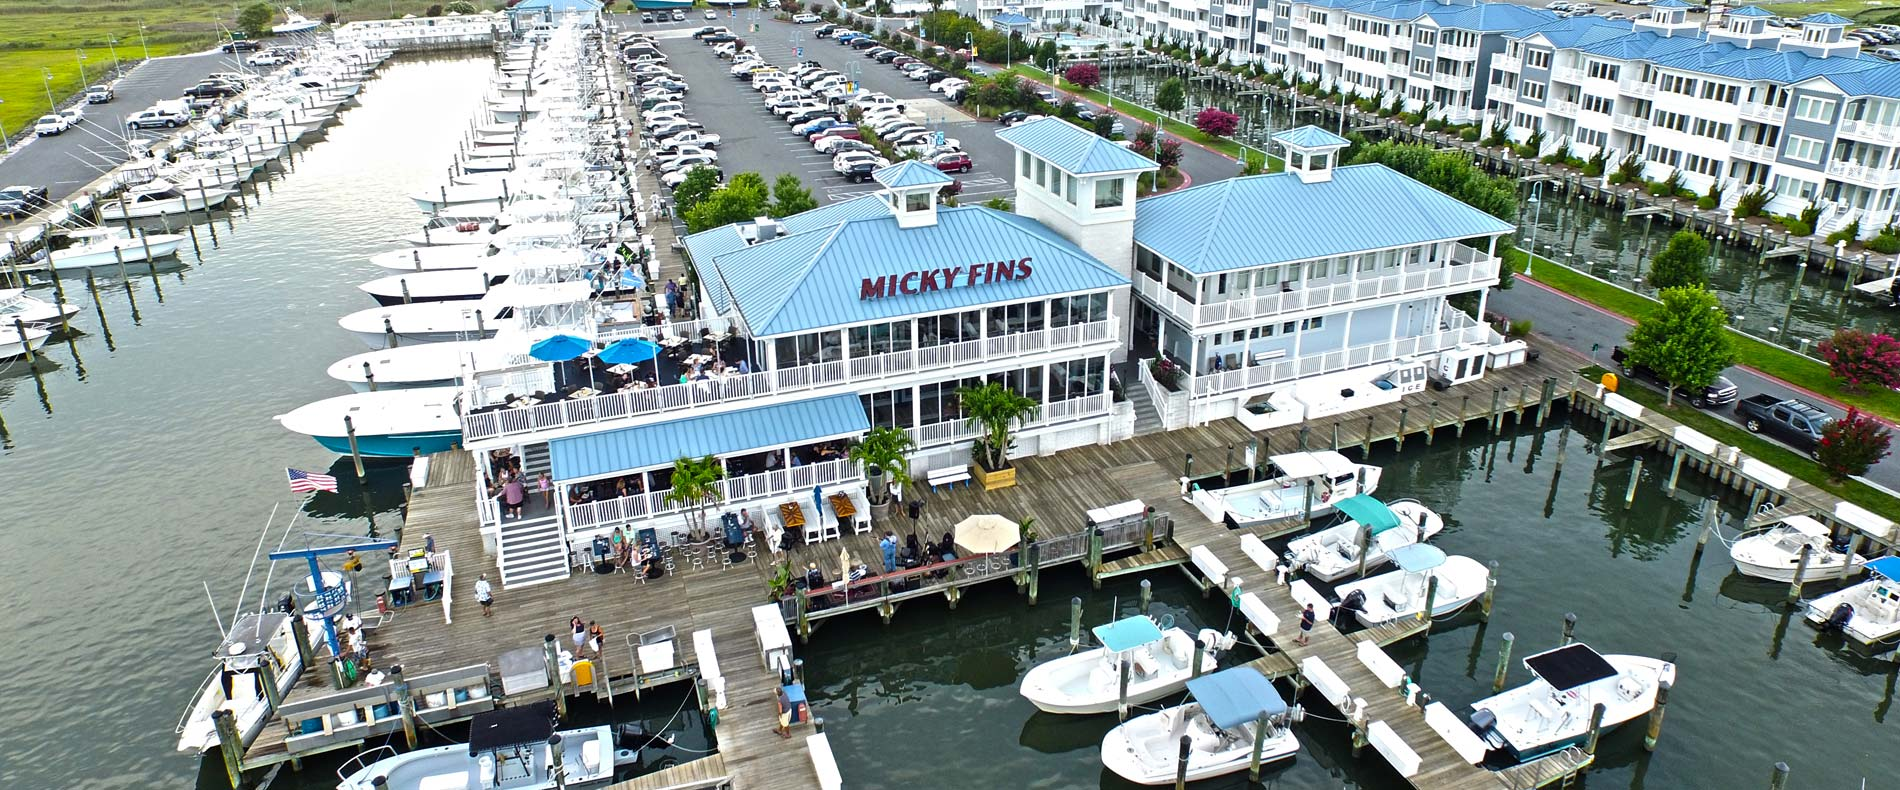 West Ocean City Marina